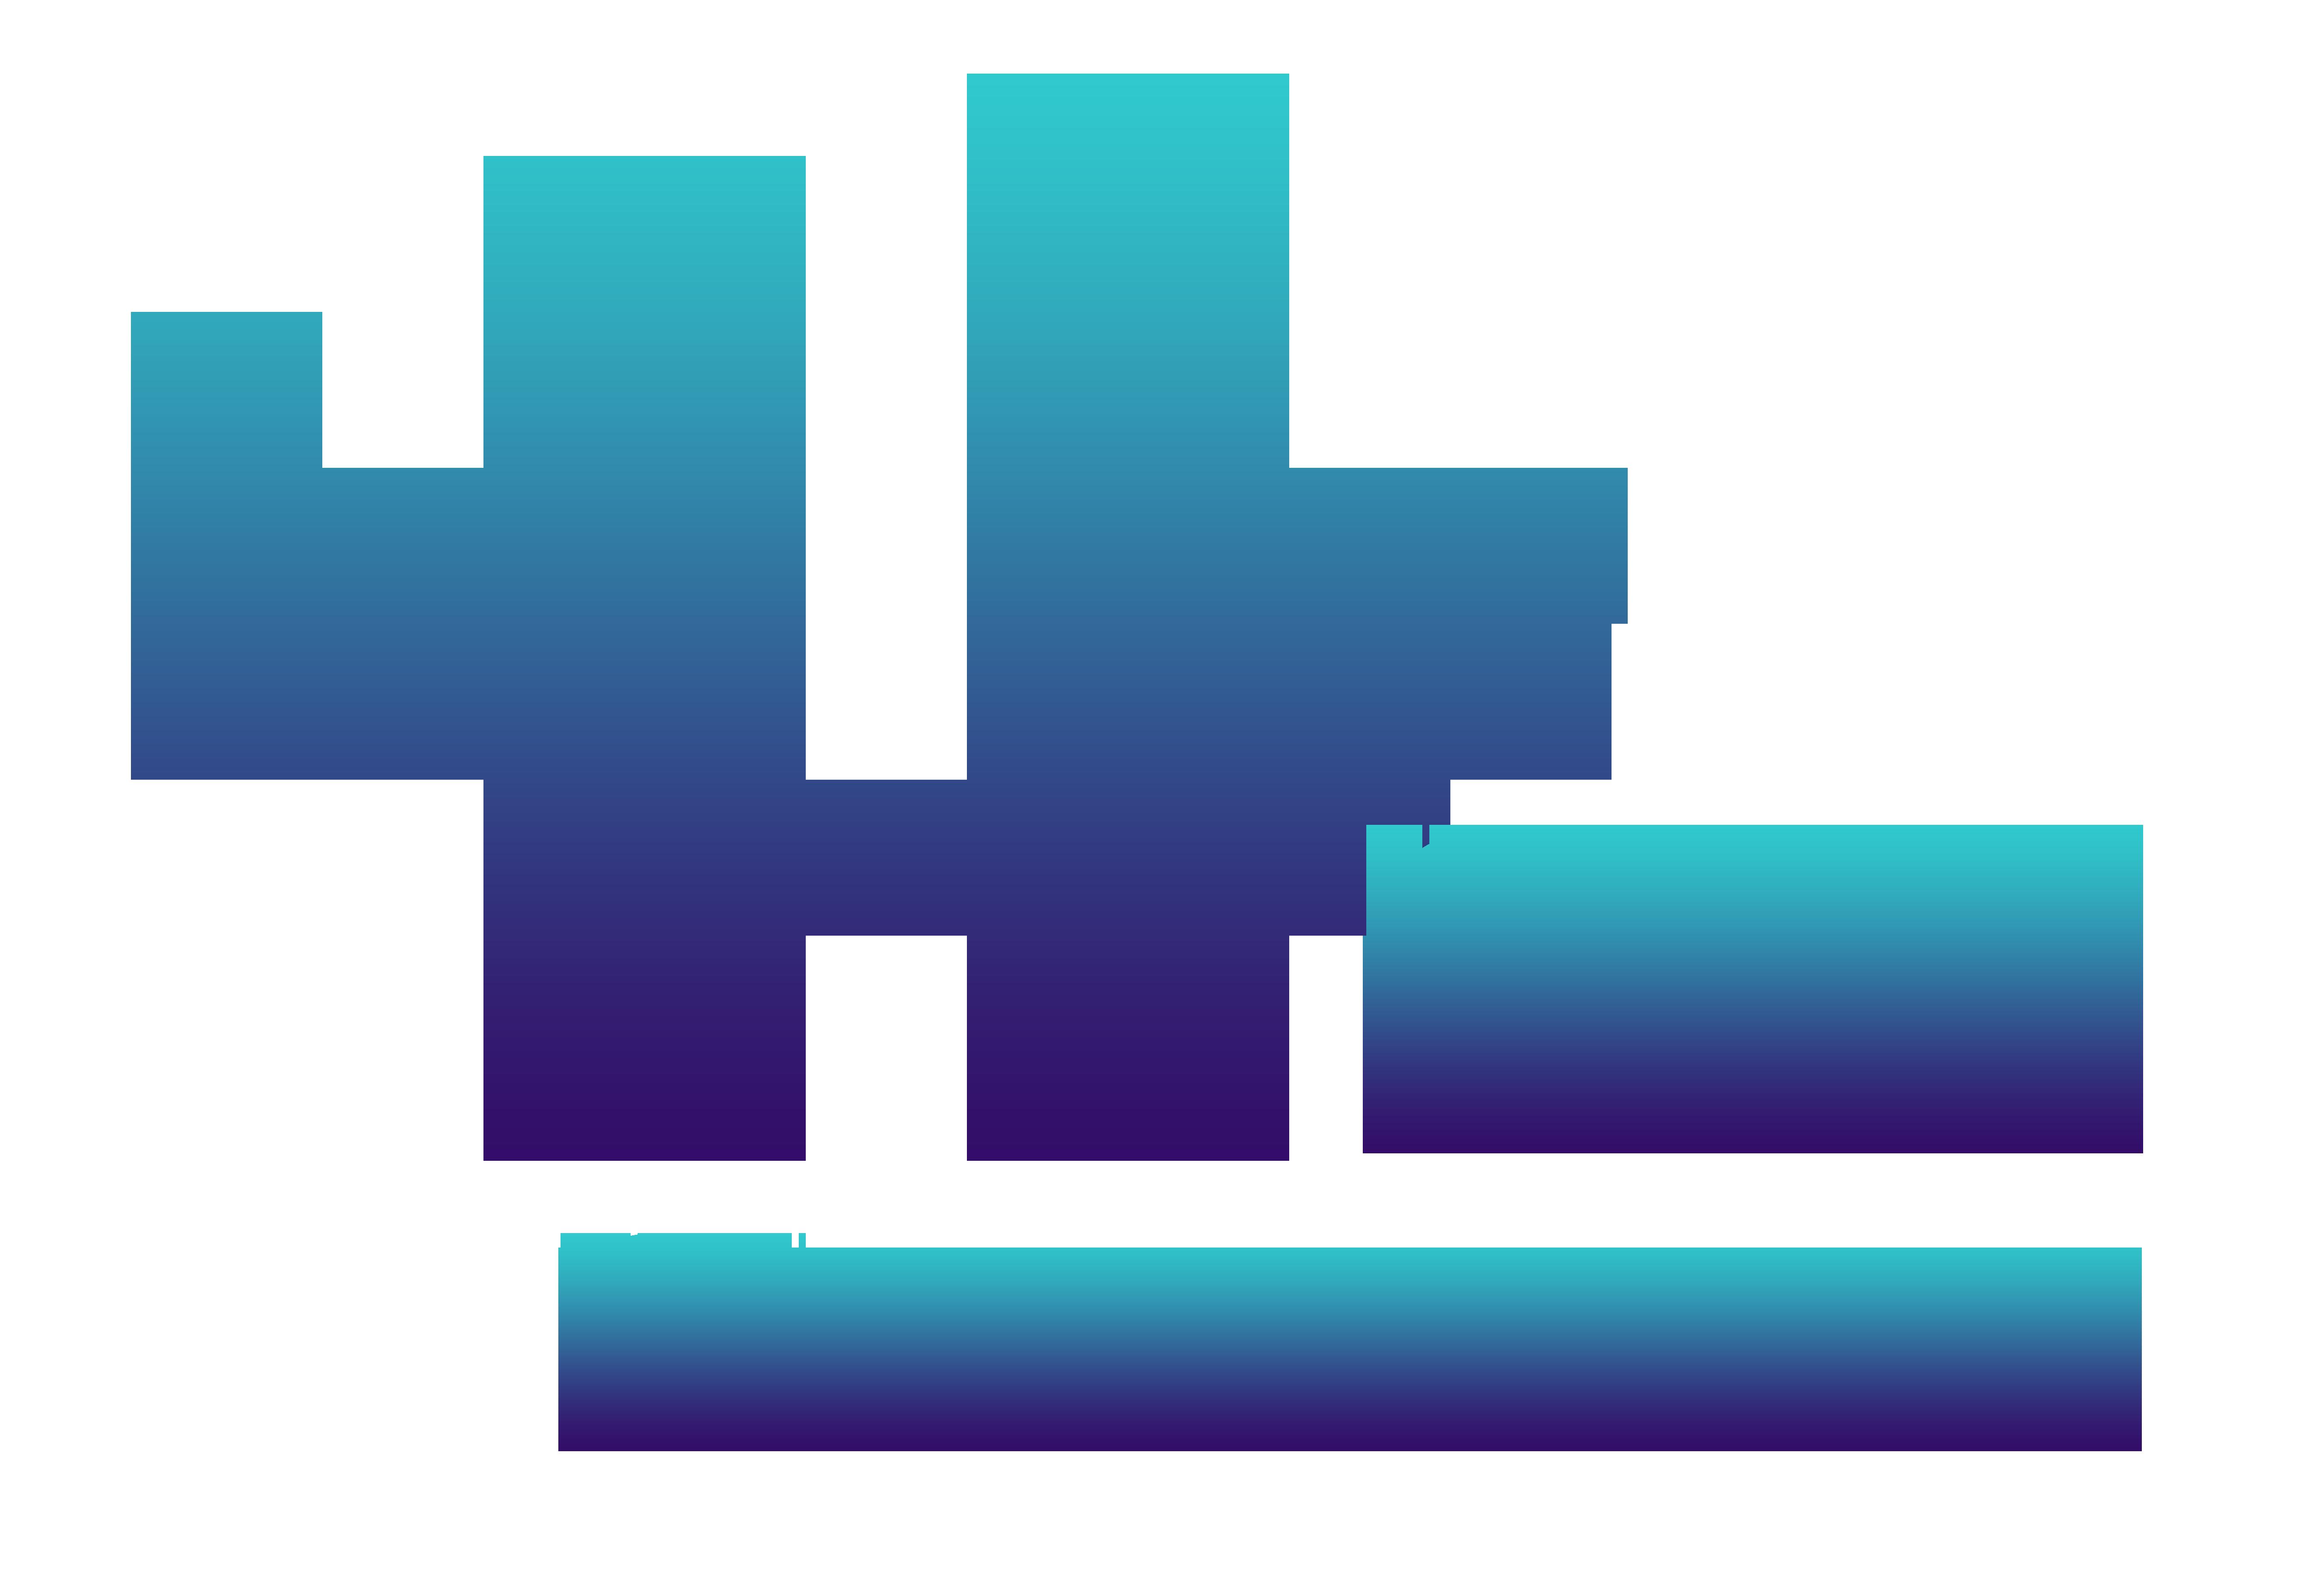 Heis Domains